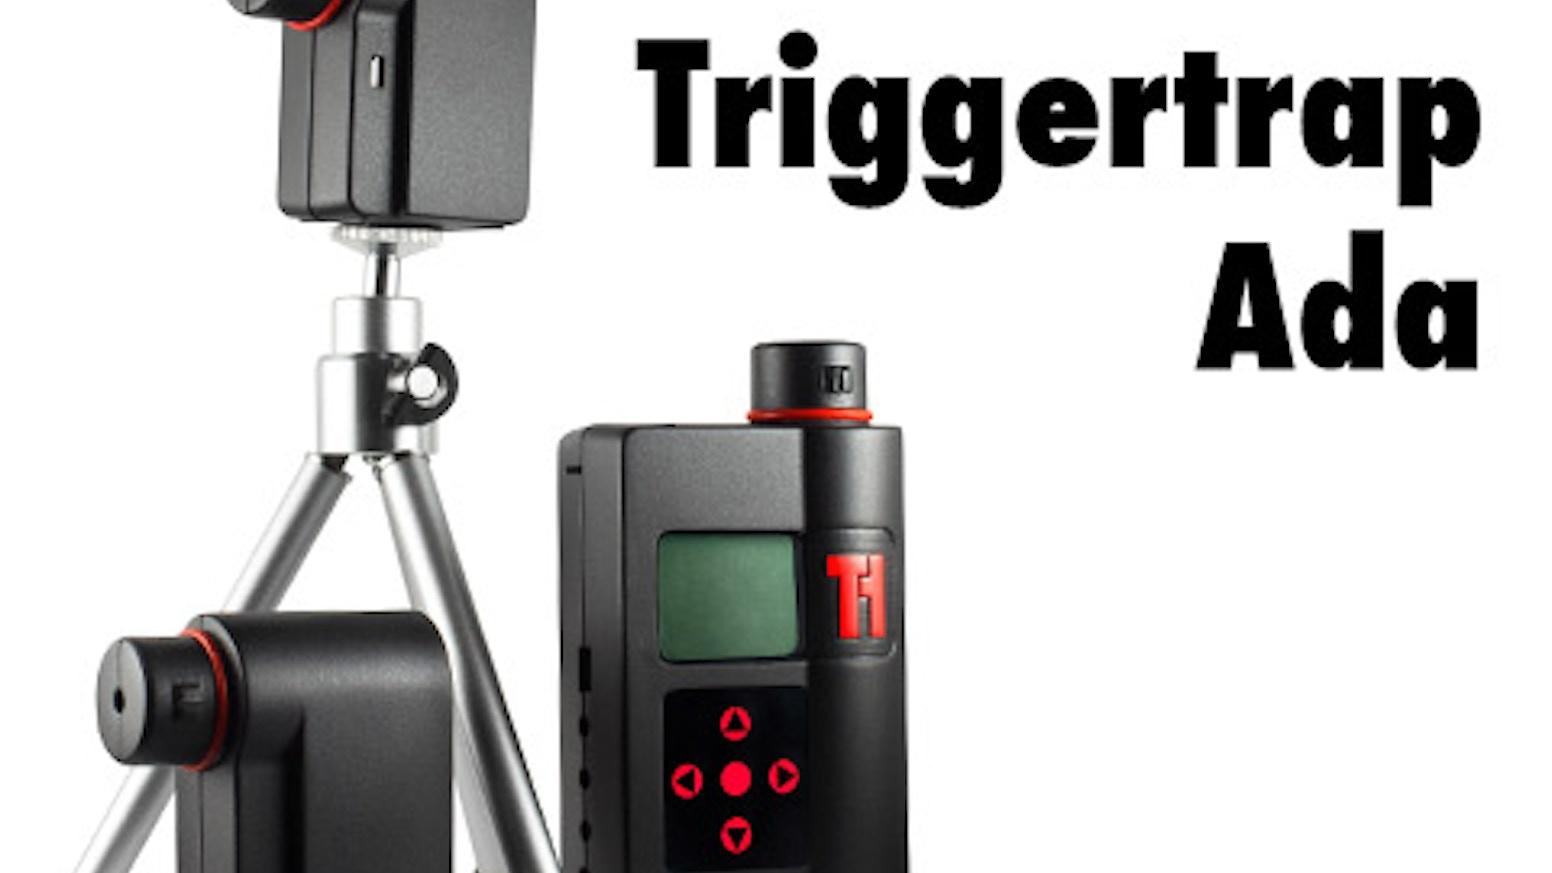 Triggertrap Ada Modular Camera Trigger By Kickstarter An Expandable Multi Zone Burglar Alarm Is Infinitely Making High Speed Trap